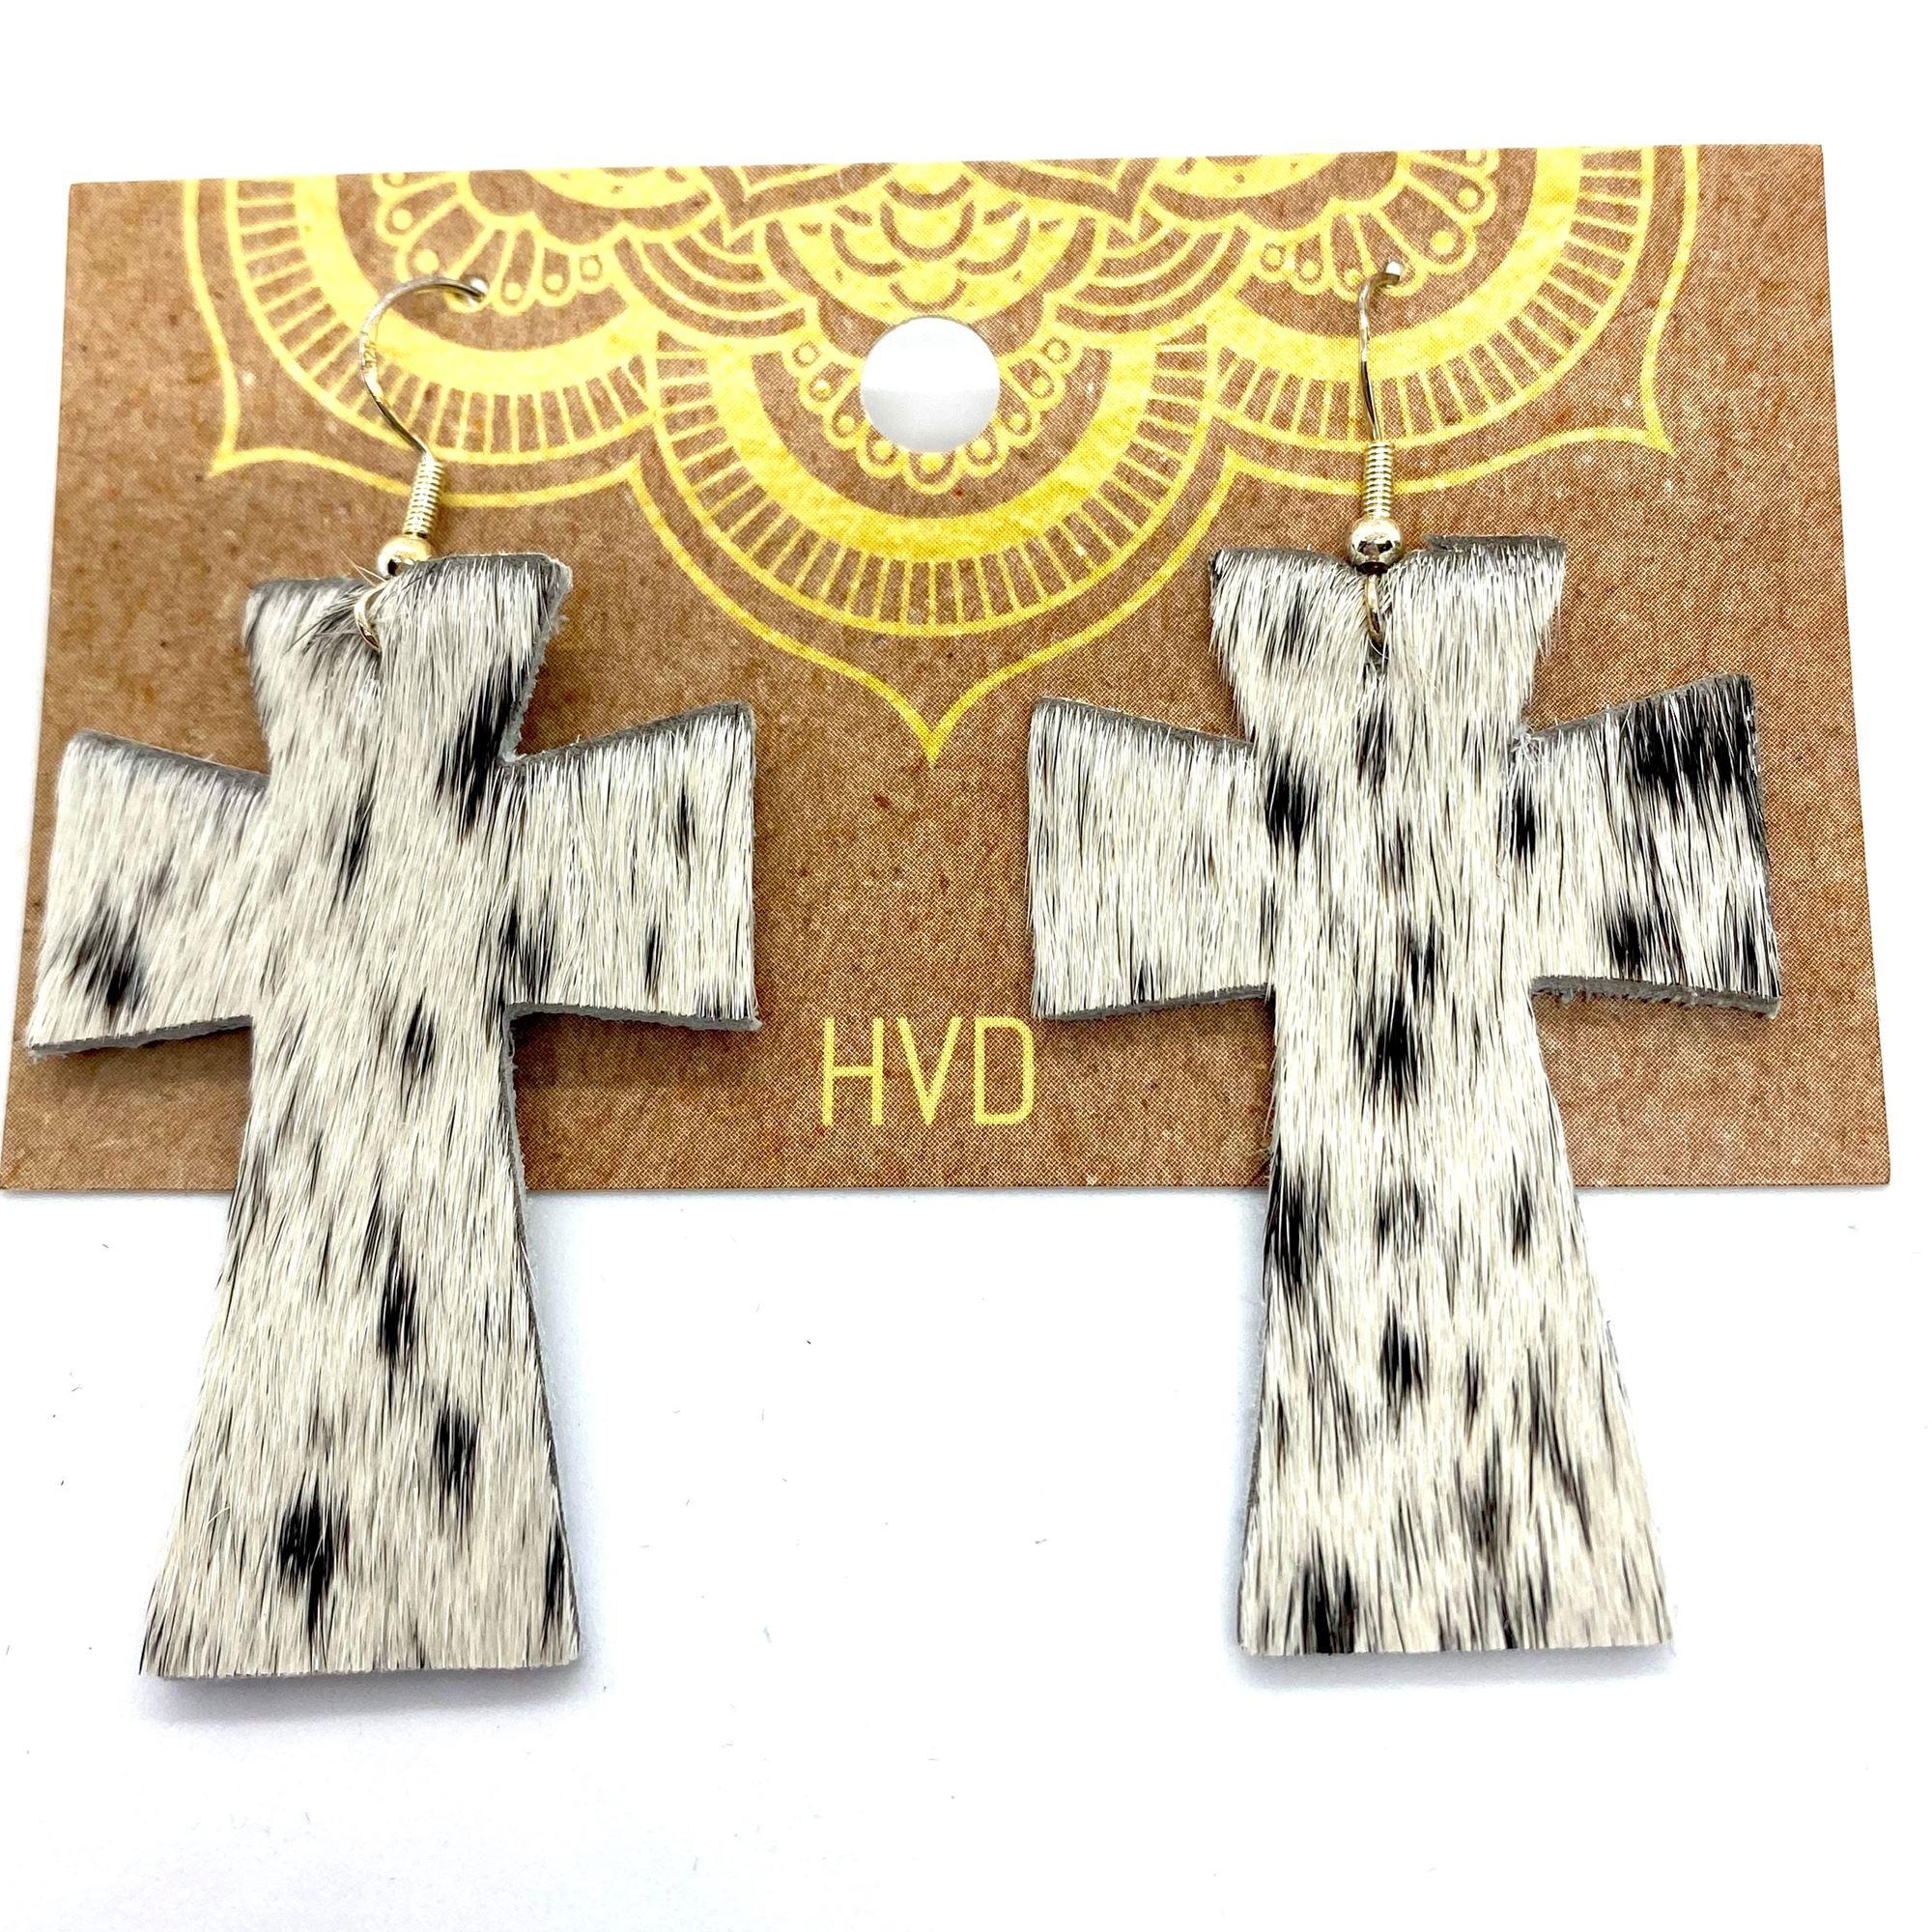 Black & White Hair-On-Hide Cross Earrings (2)